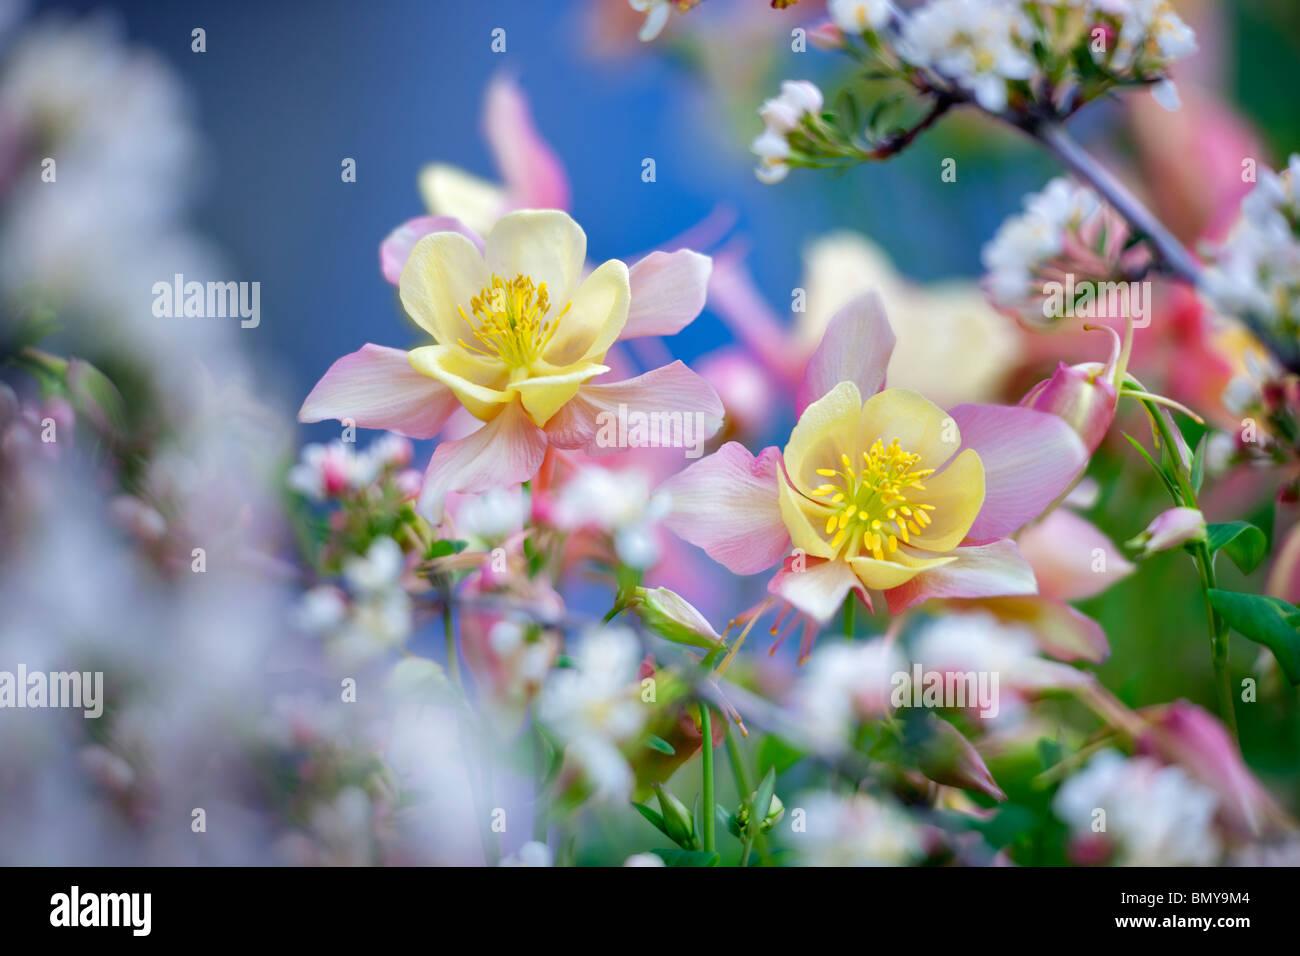 Columbine Flower Stock Photos Columbine Flower Stock Images Alamy